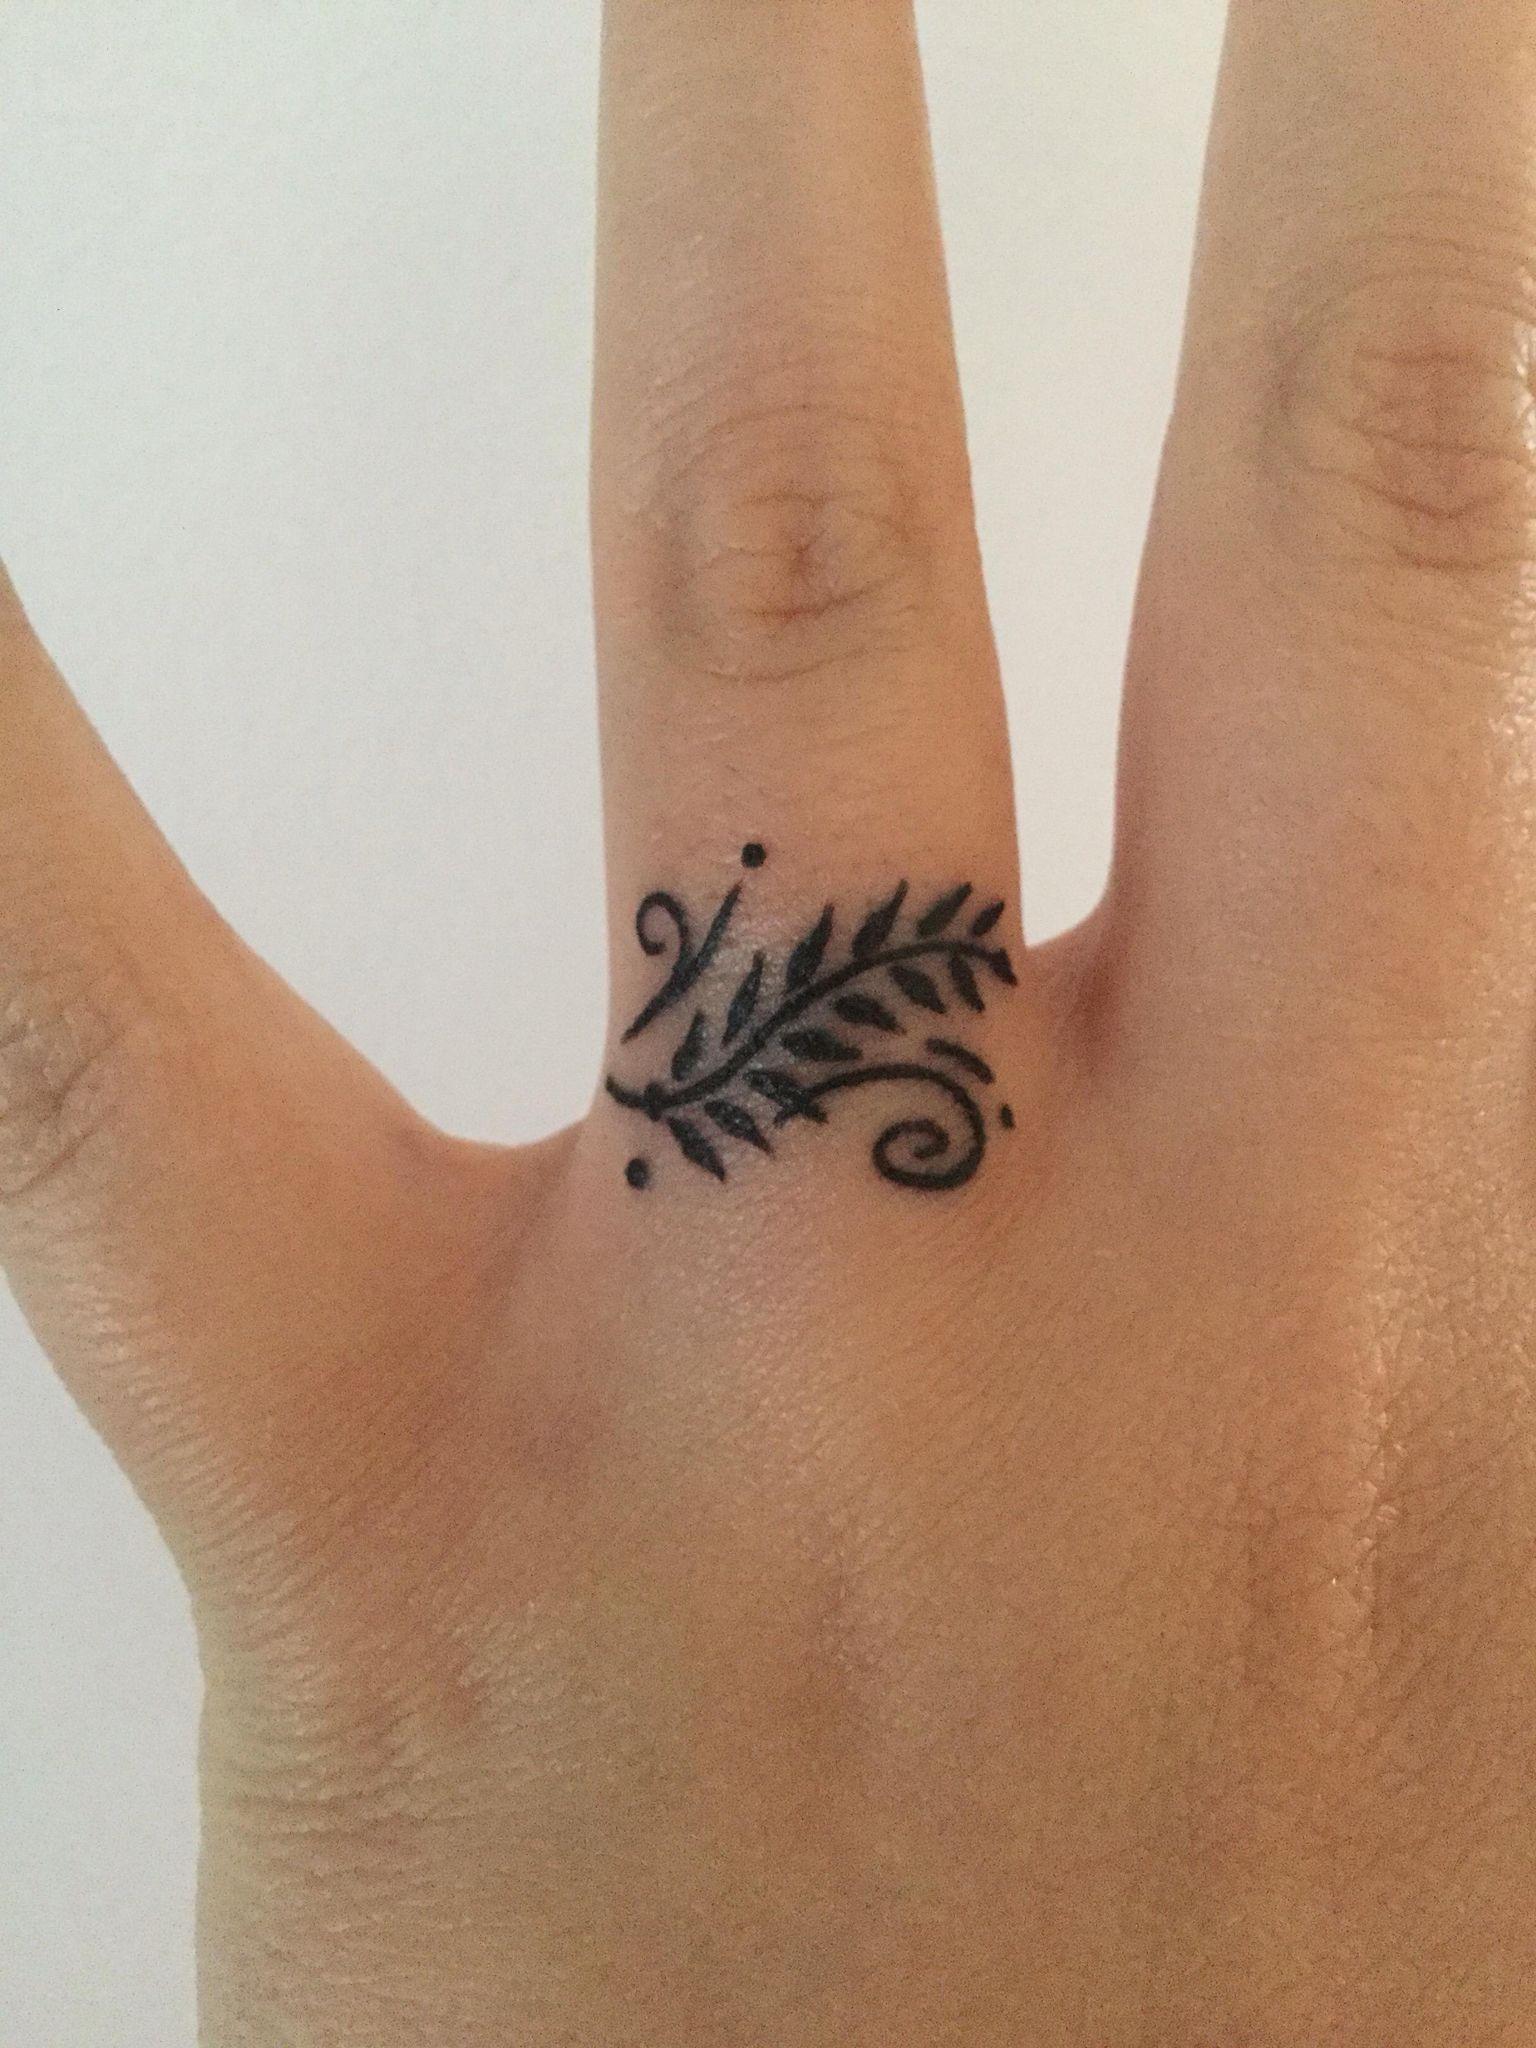 Mano Izquierda Tatoo Tatuajes En Los Dedos Tatuaje De Anillos Y